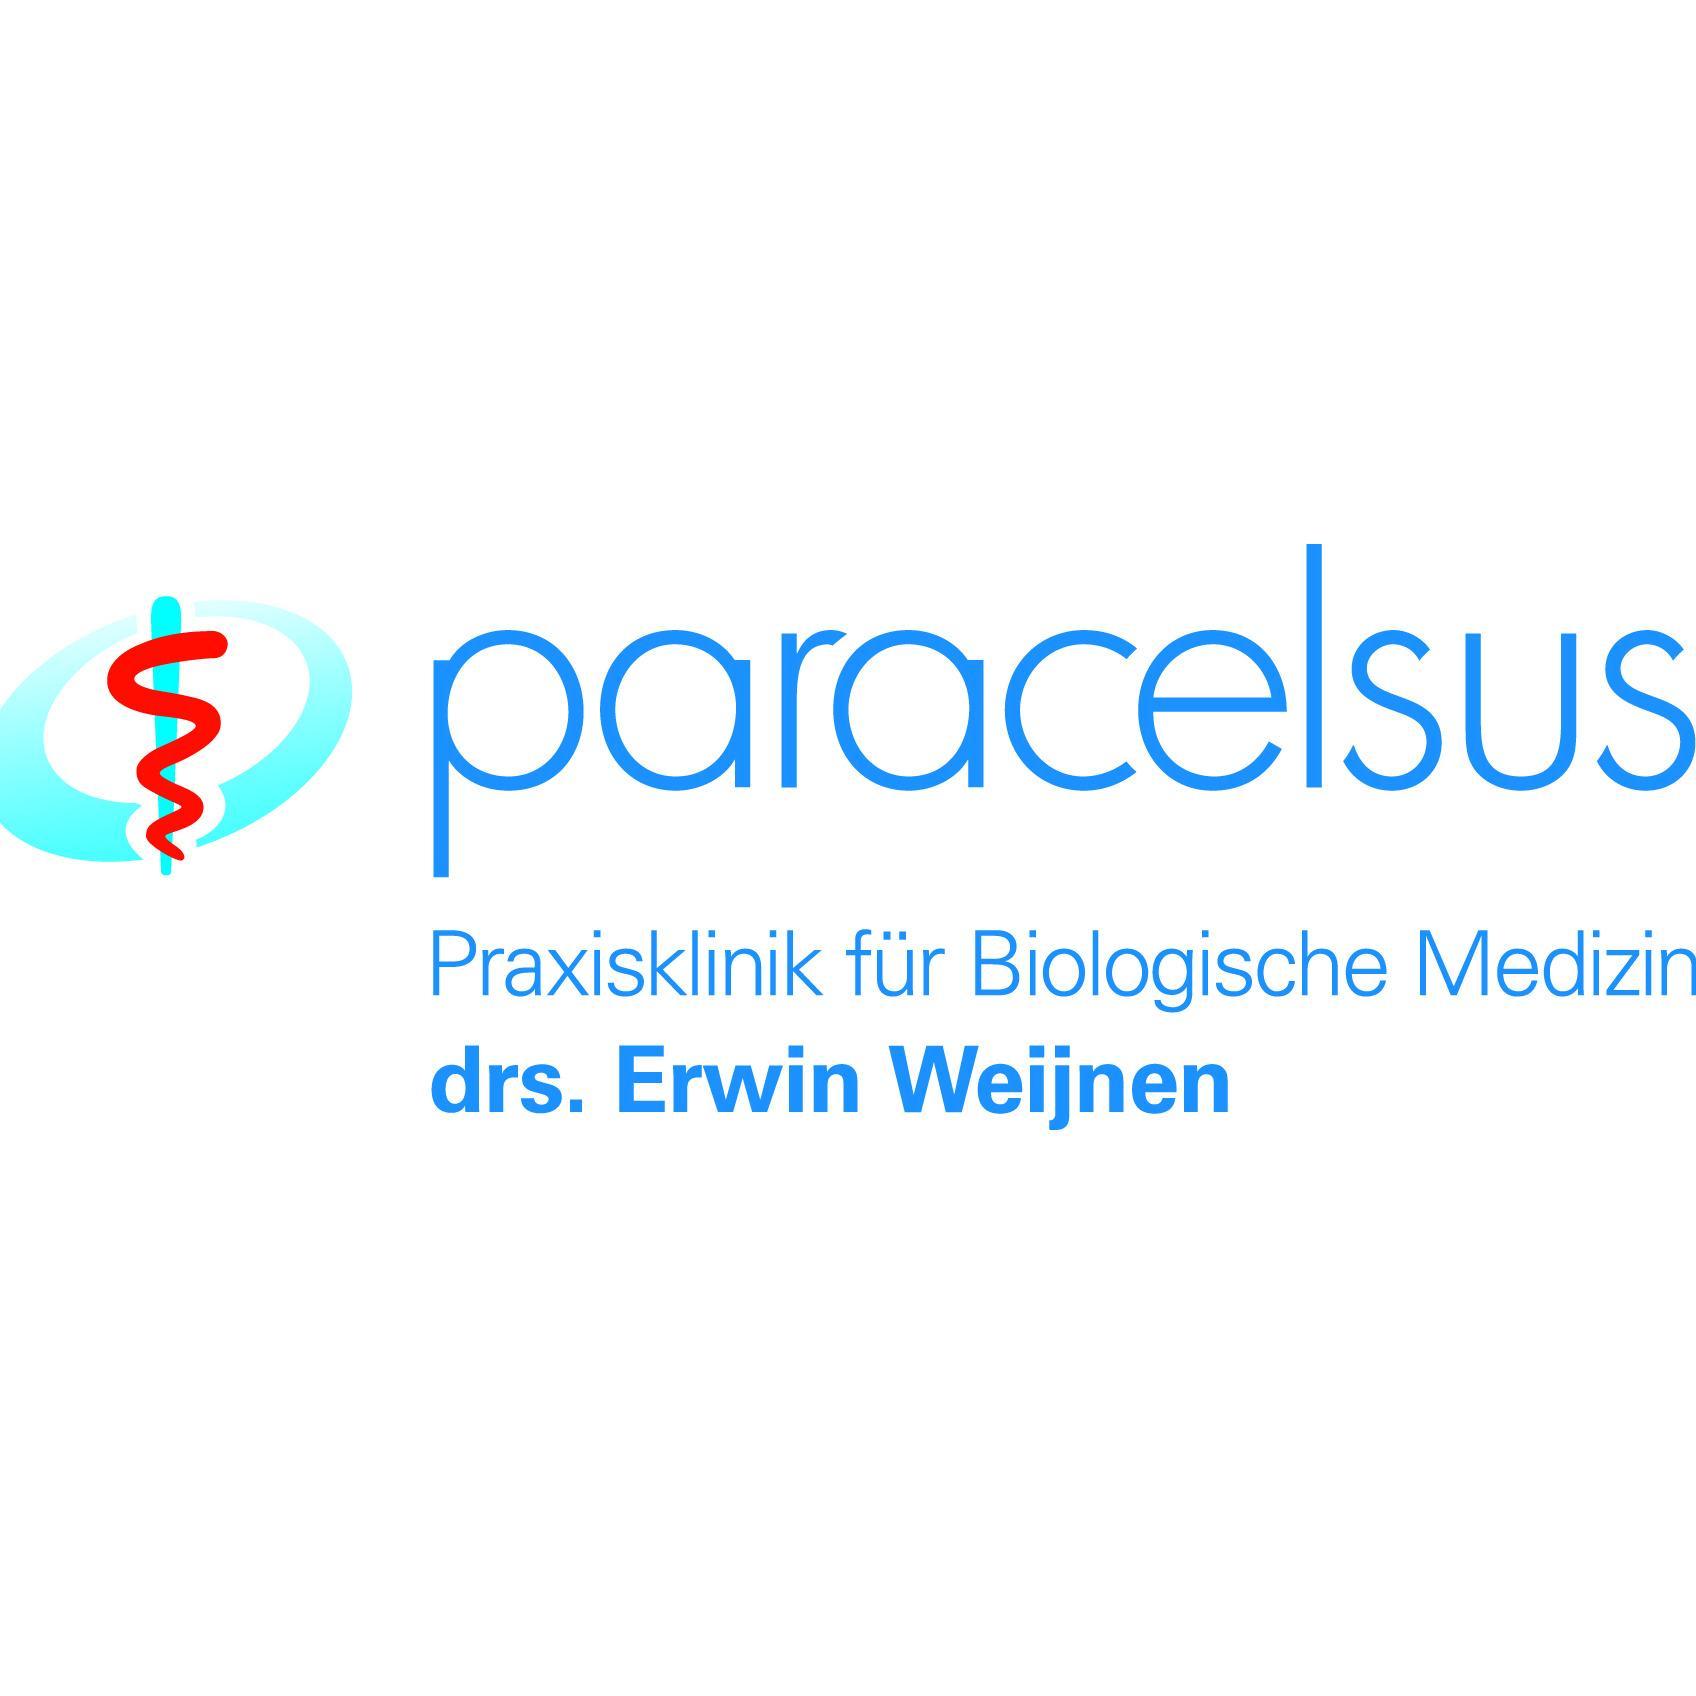 Bild zu Paracelsus Praxisklinik - Biologische Medizin & Krebstherapie in Nürnberg